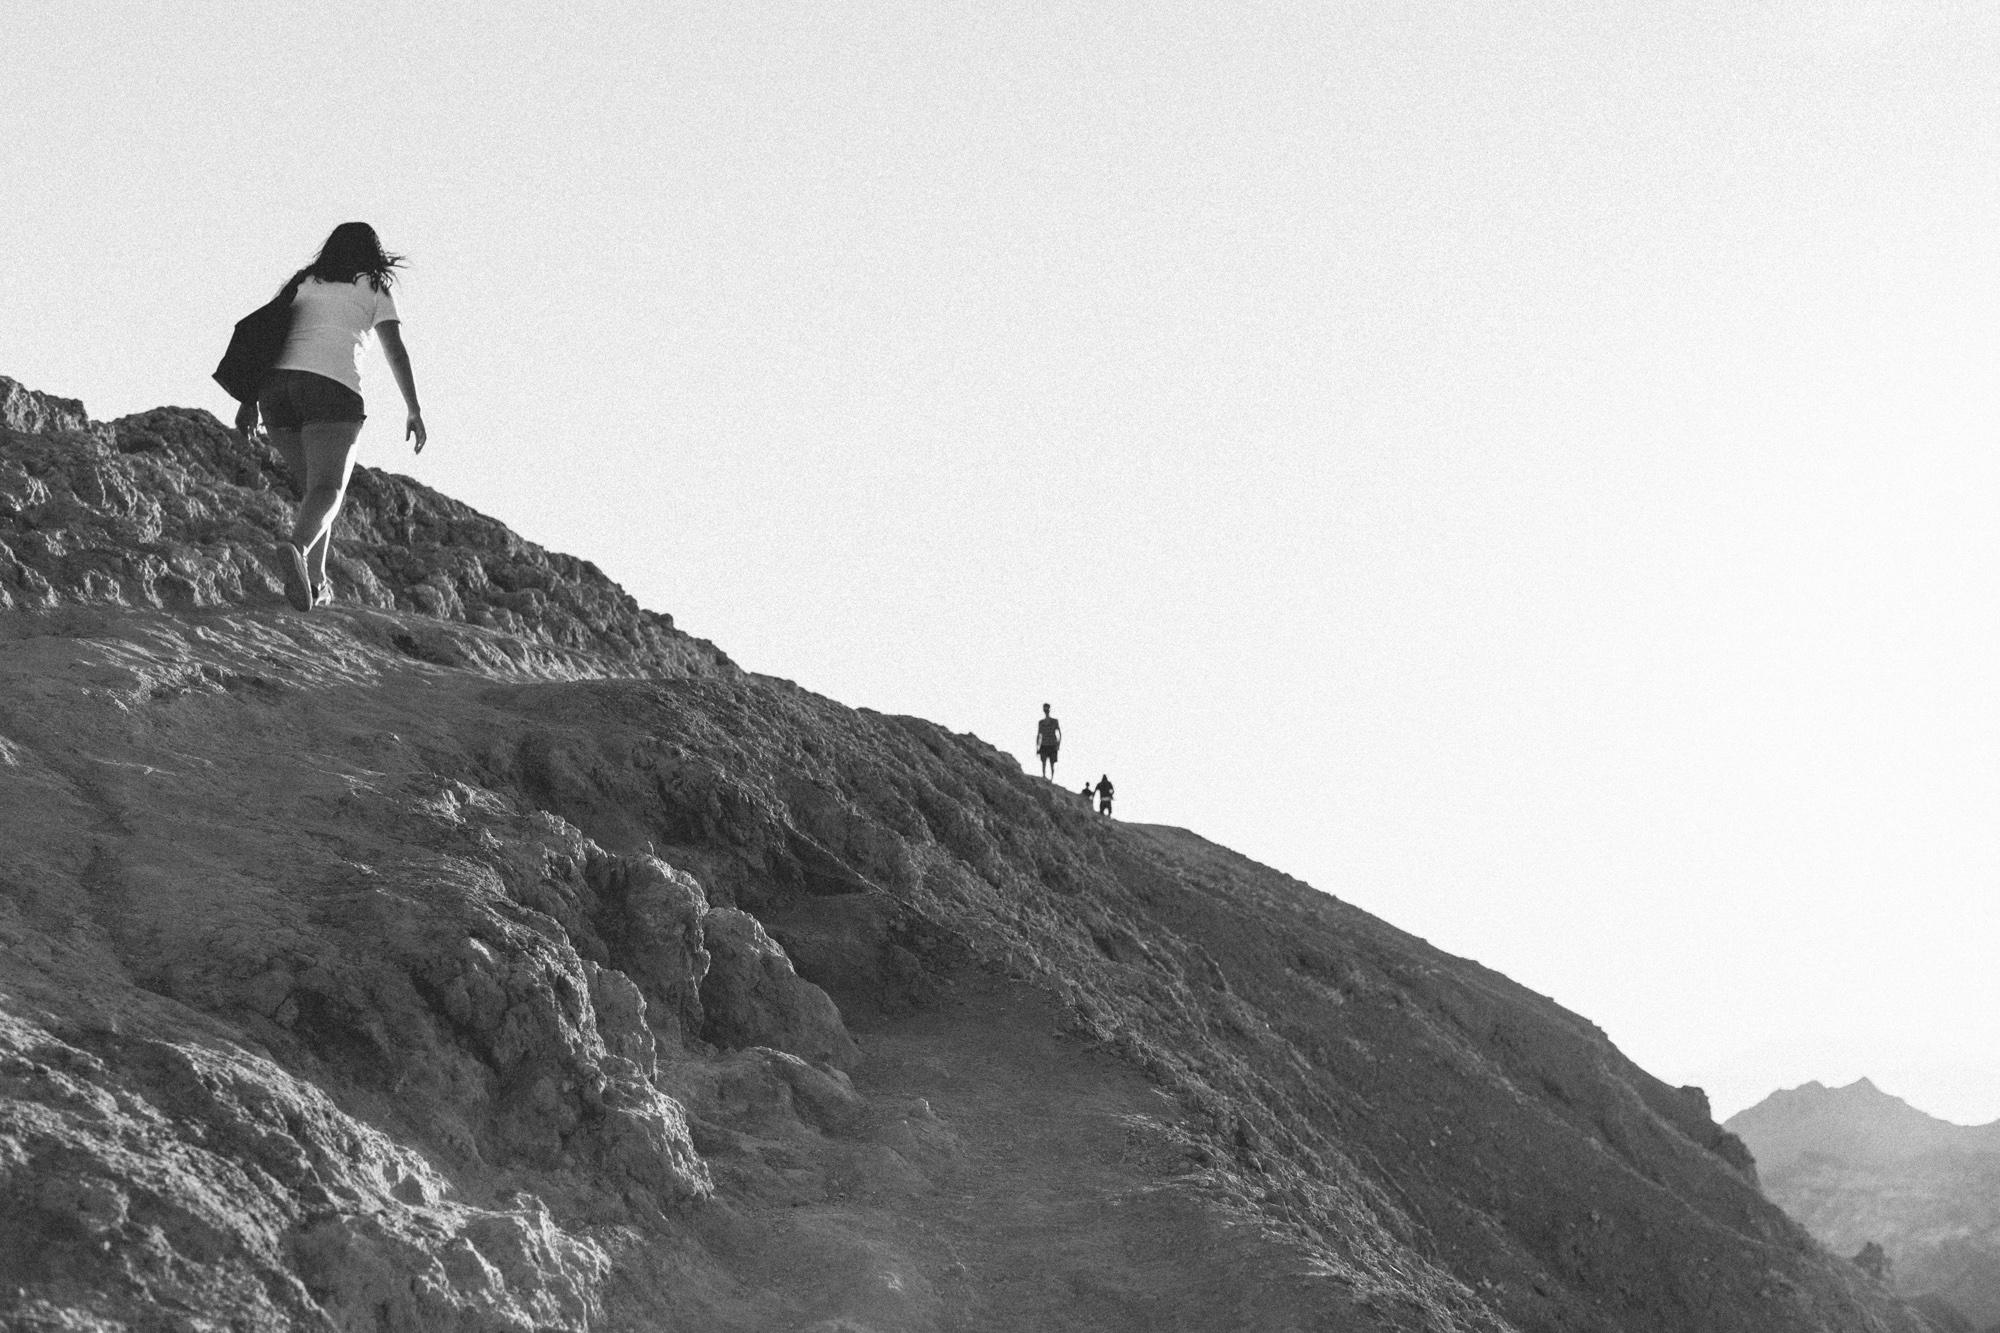 Mael Lambla photographer Chile San pedro atacama desert-149.jpg